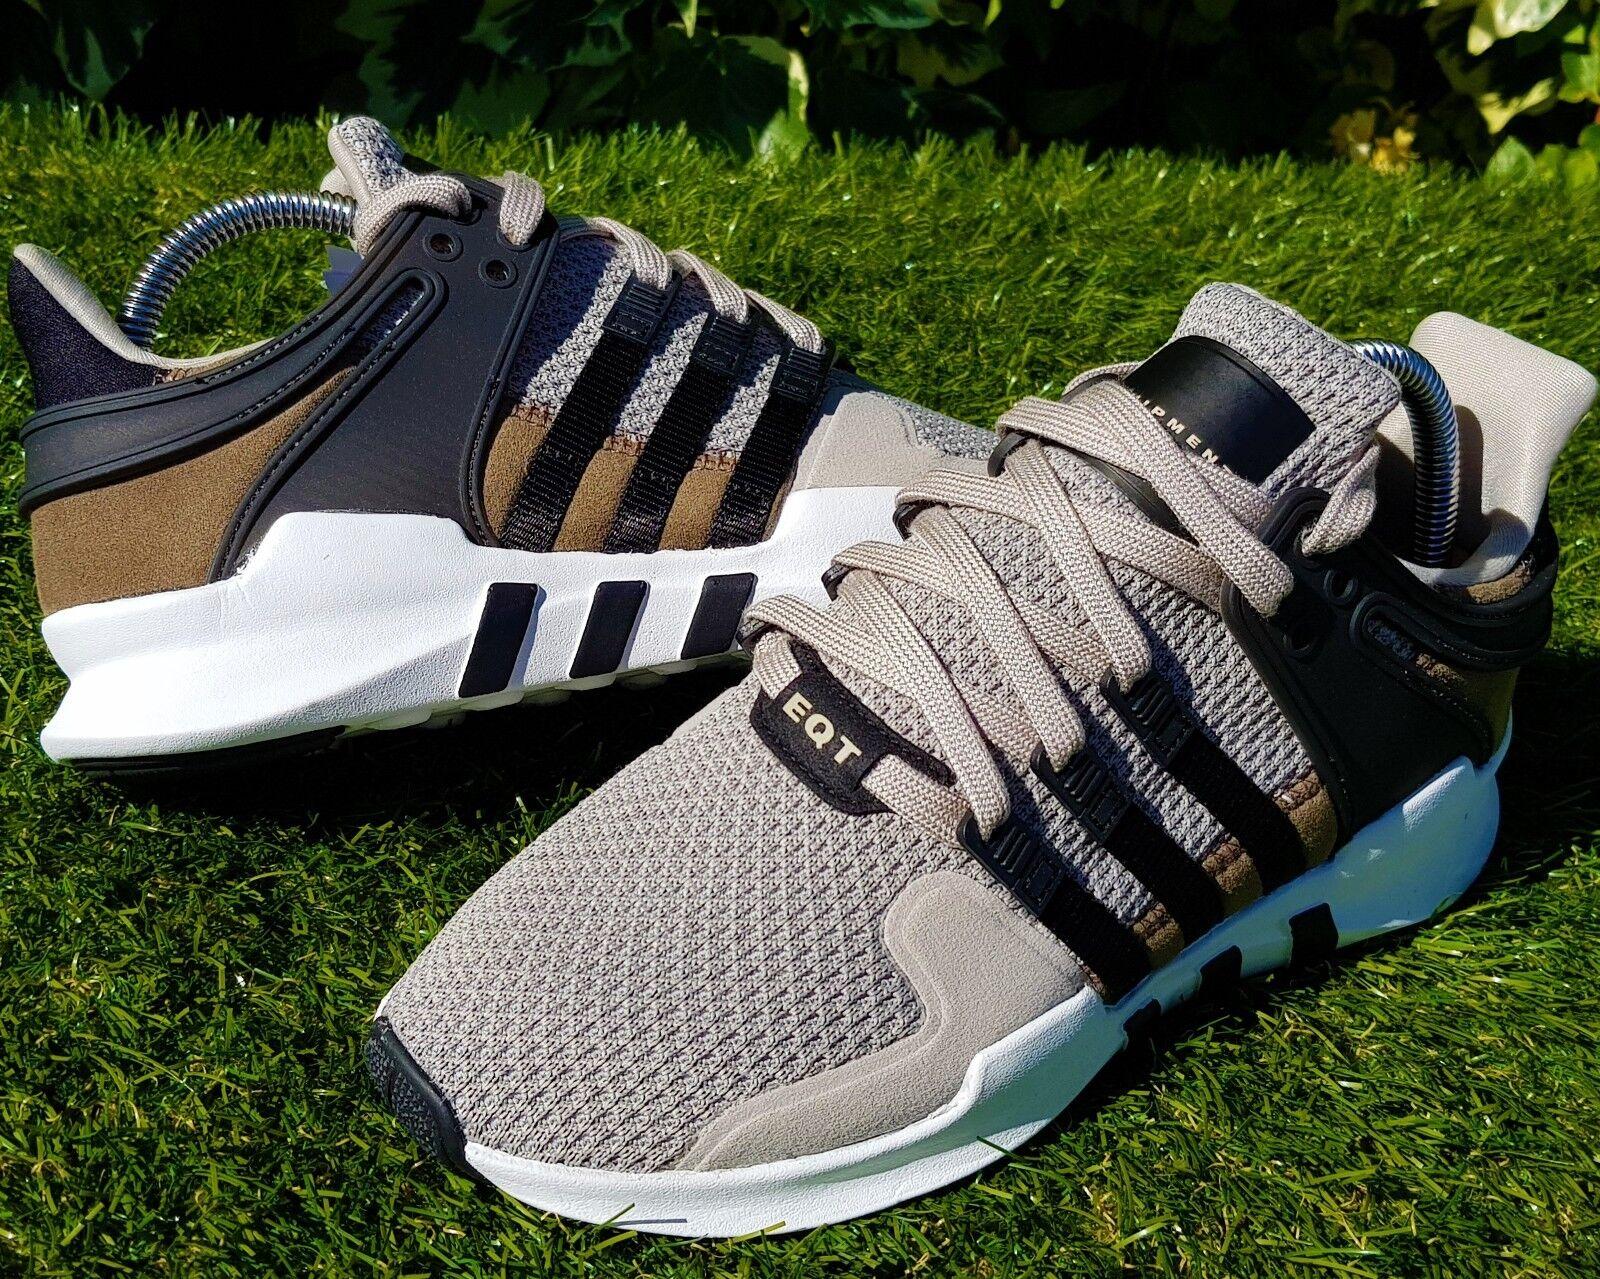 BNWB Adidas Originals Equipment ® EQT Support Adv 91/17 Trainers UK Größe 4.5